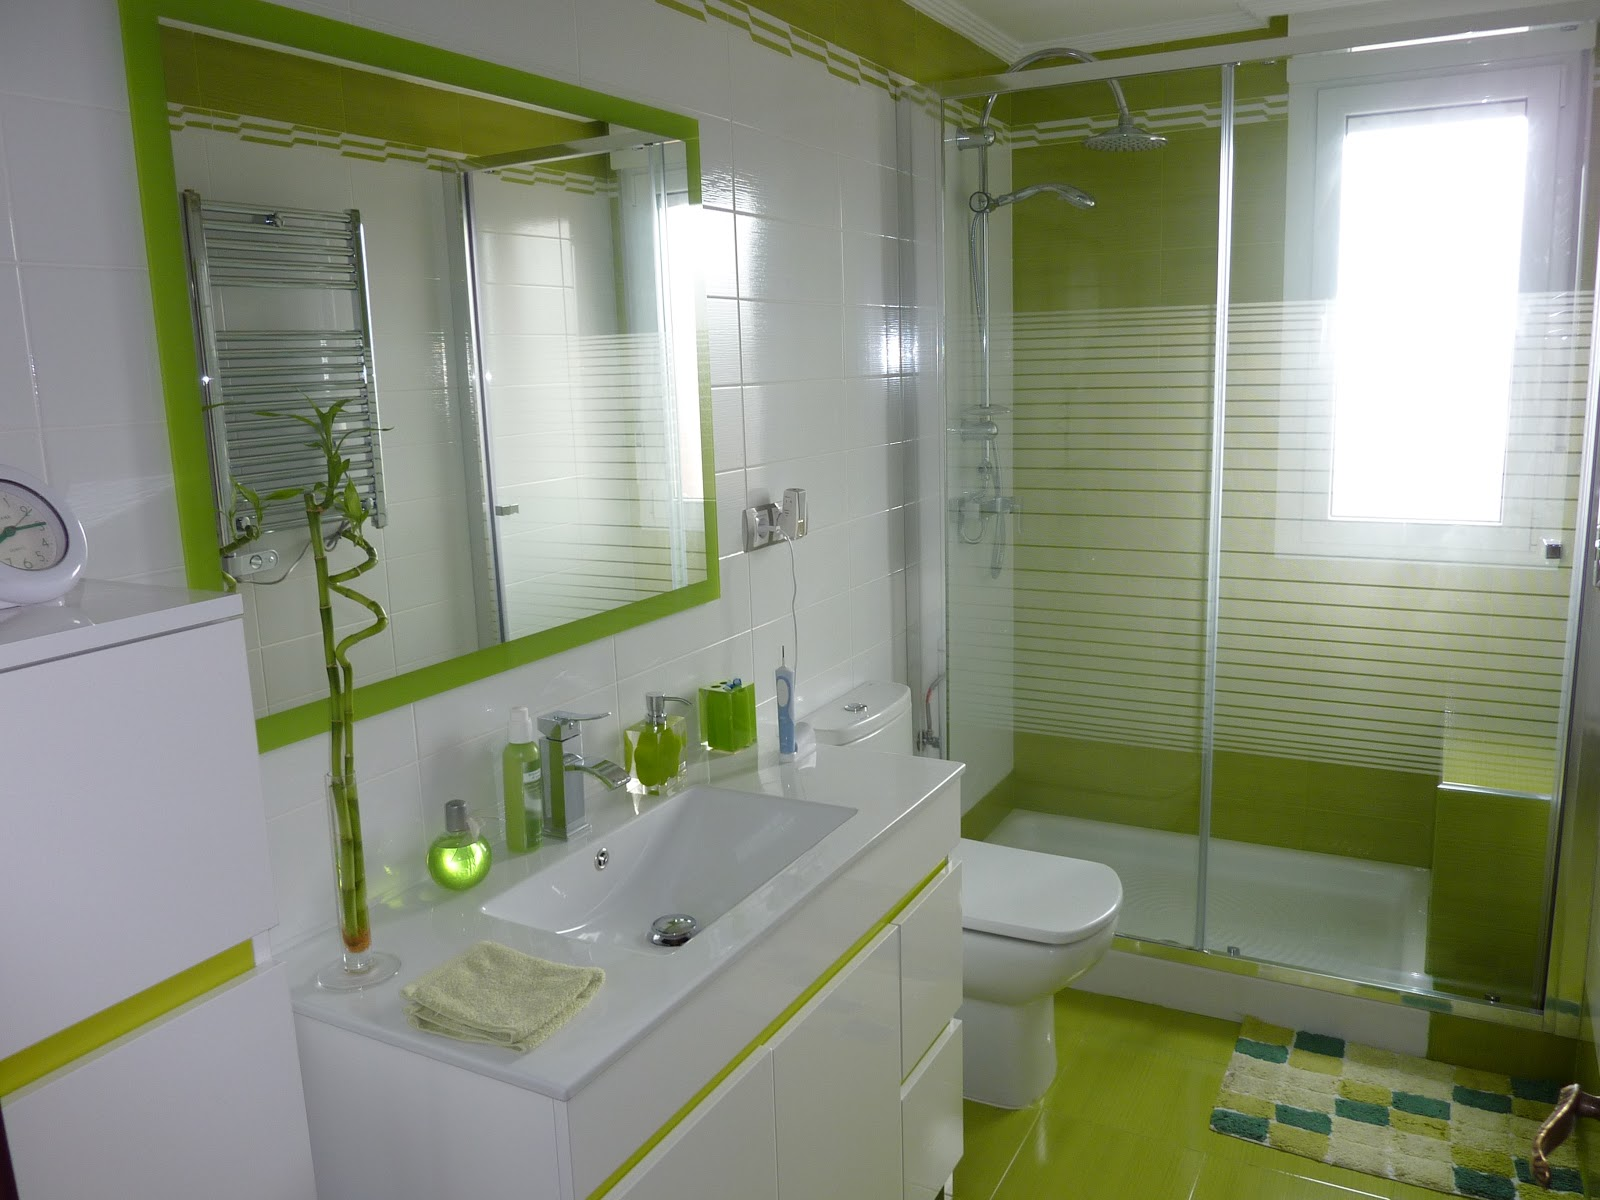 Ba os en verde pistacho for Color verde grisaceo para paredes